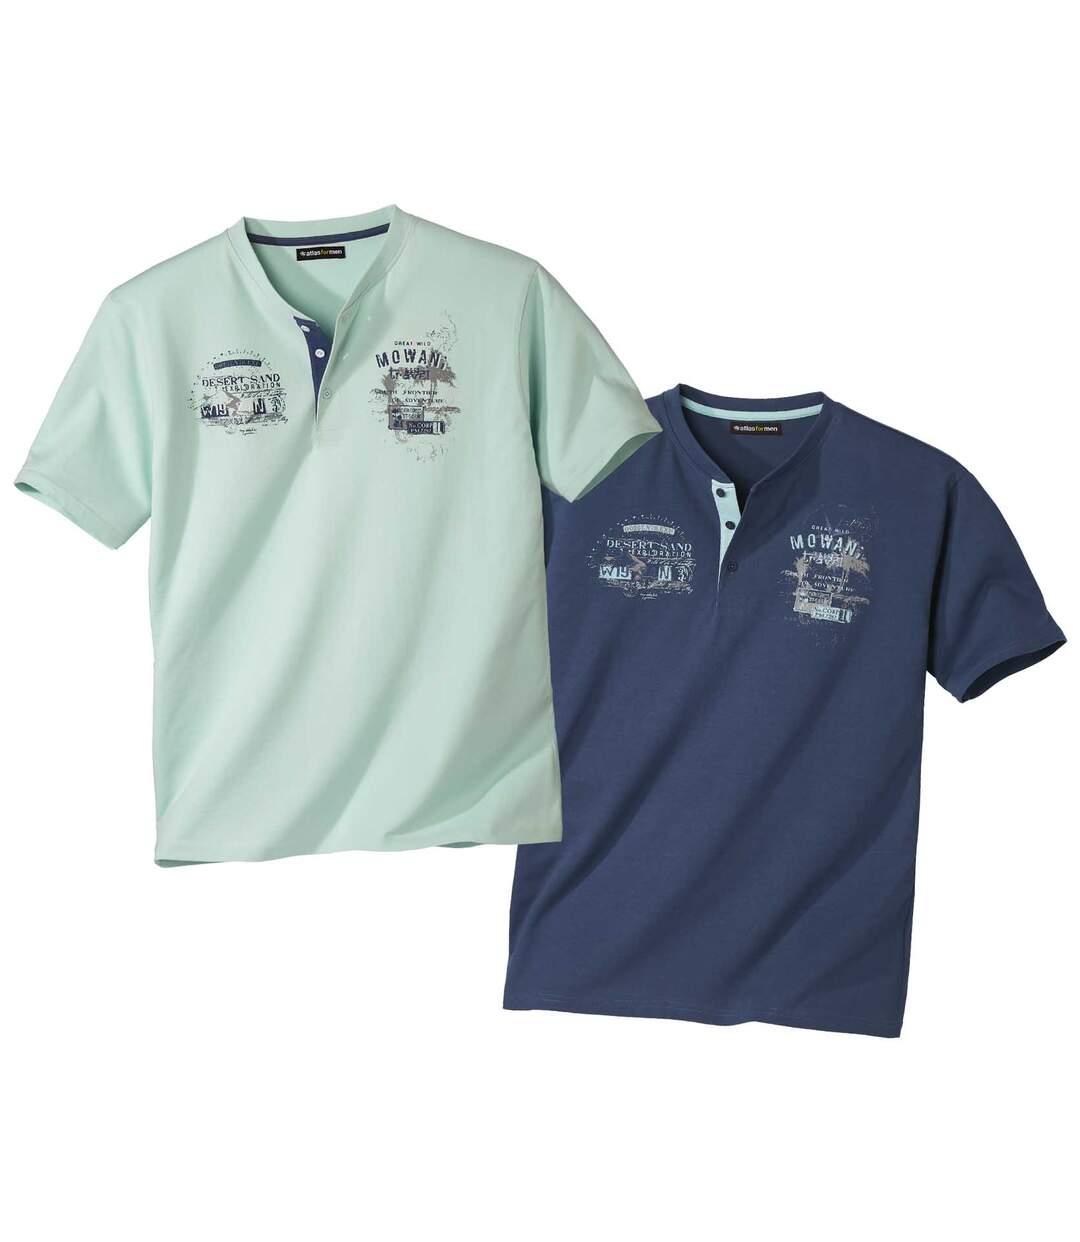 Pack of 2 Men's Exploration T-Shirts - Navy Blue